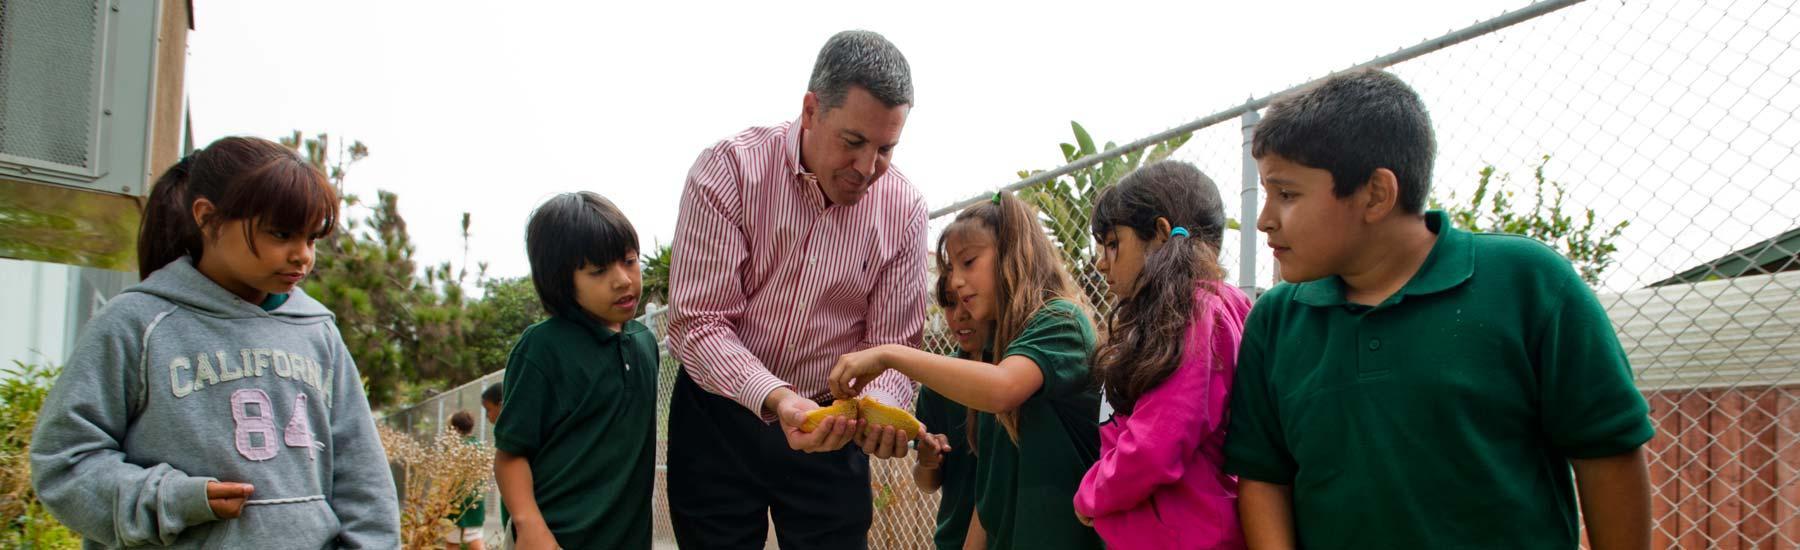 GSEP professor works with children - Pepperdine GSEP